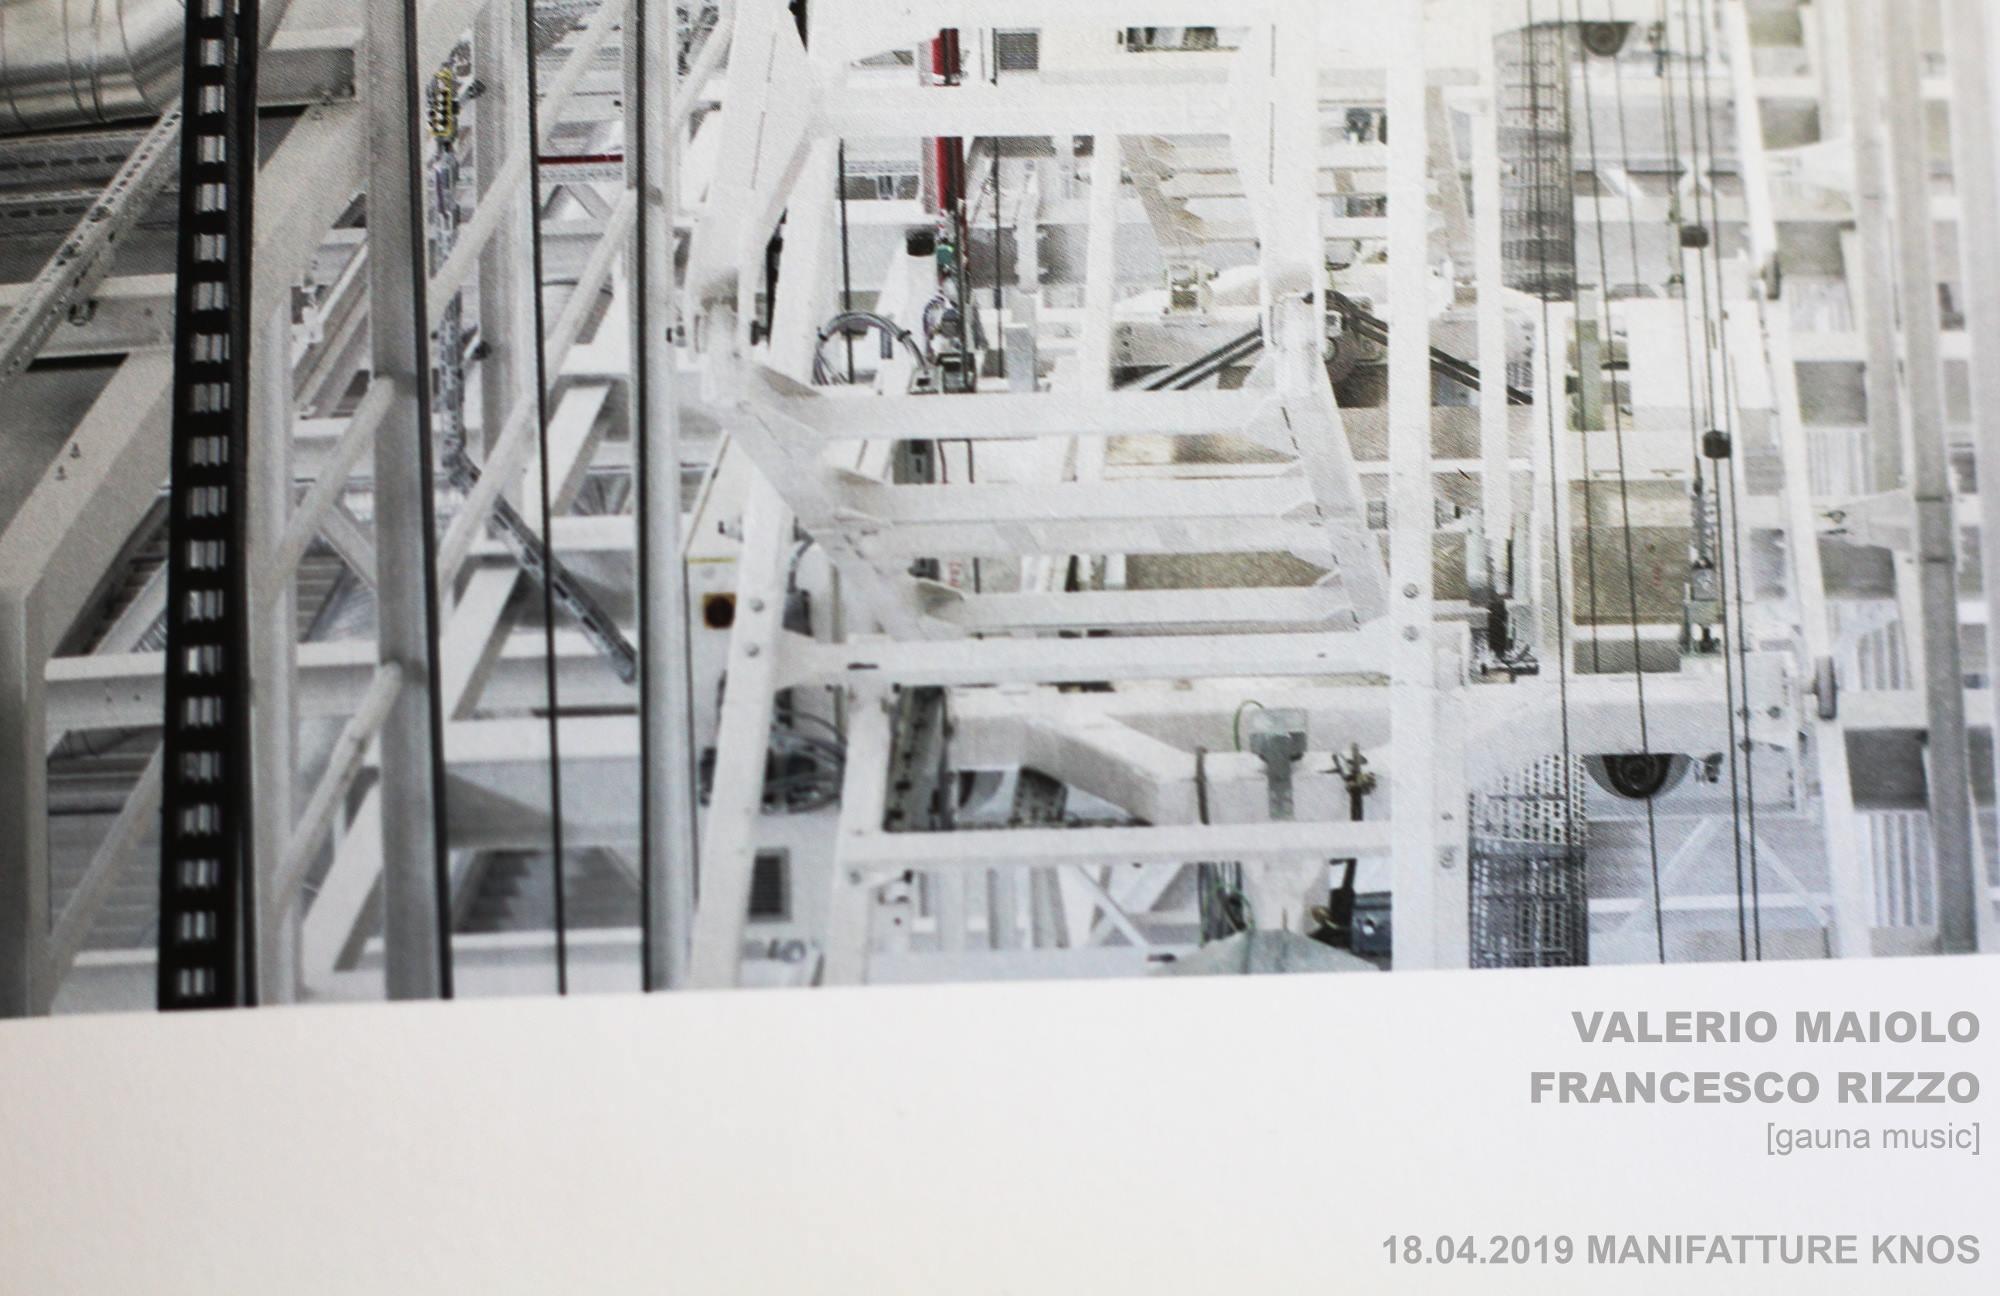 Valerio Maiolo // Francesco Rizzo [A/V Performance]